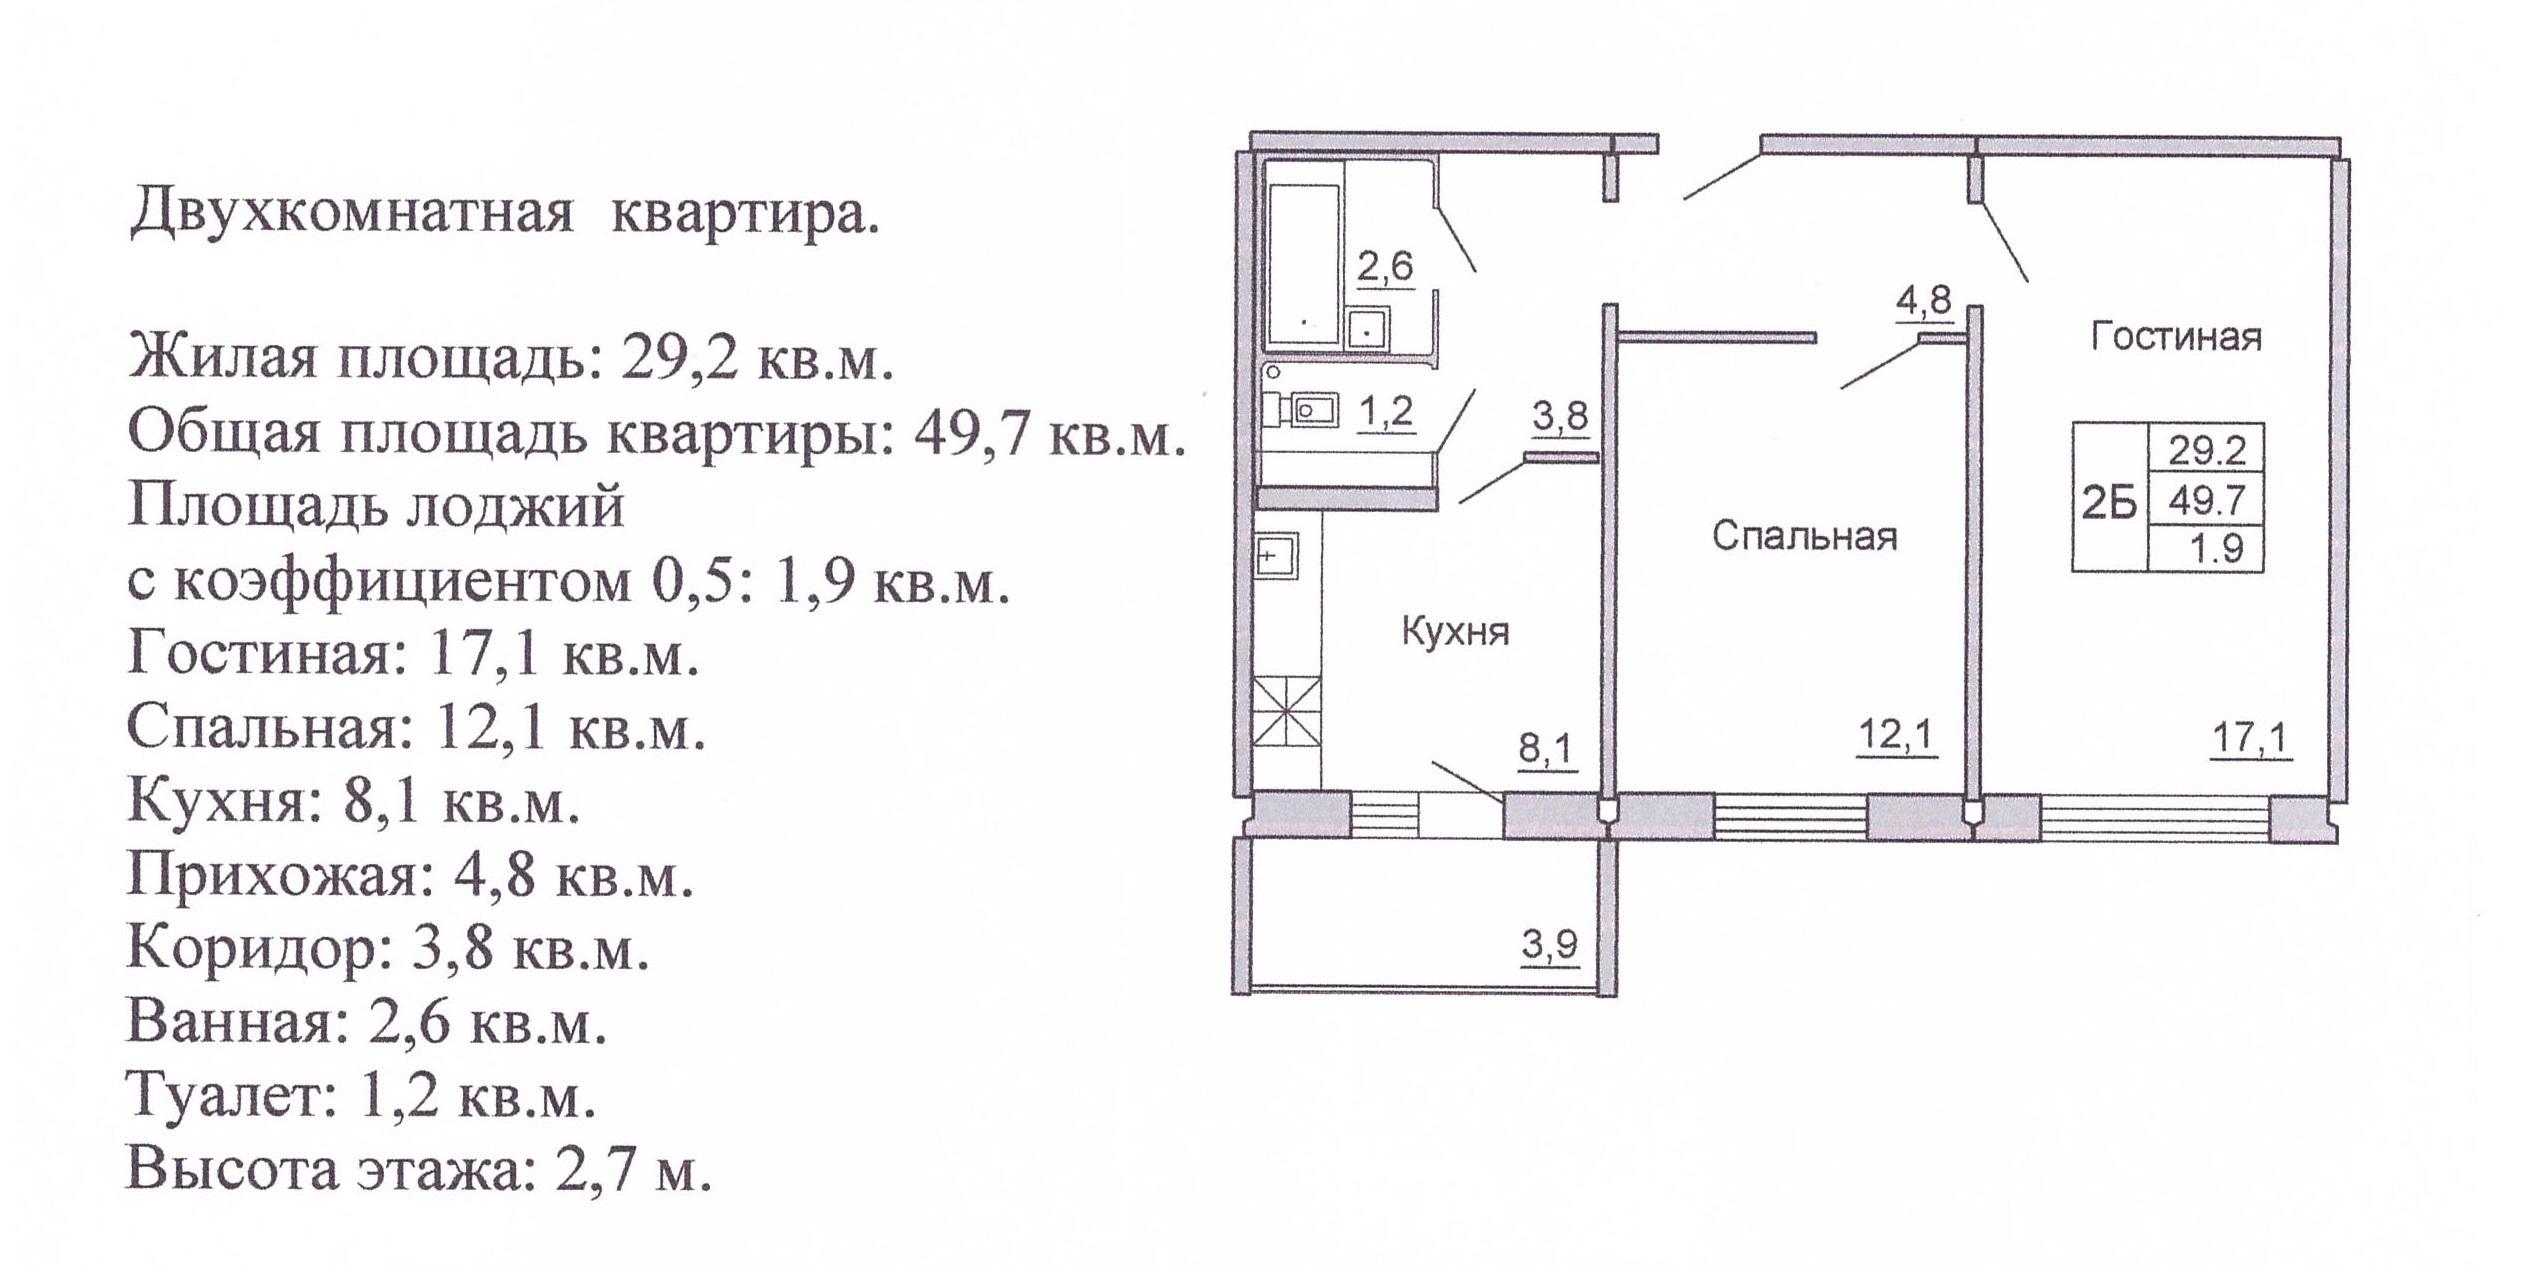 2-к квартира, 51.6 м?, ул новгородская д. 18а - объявление н.